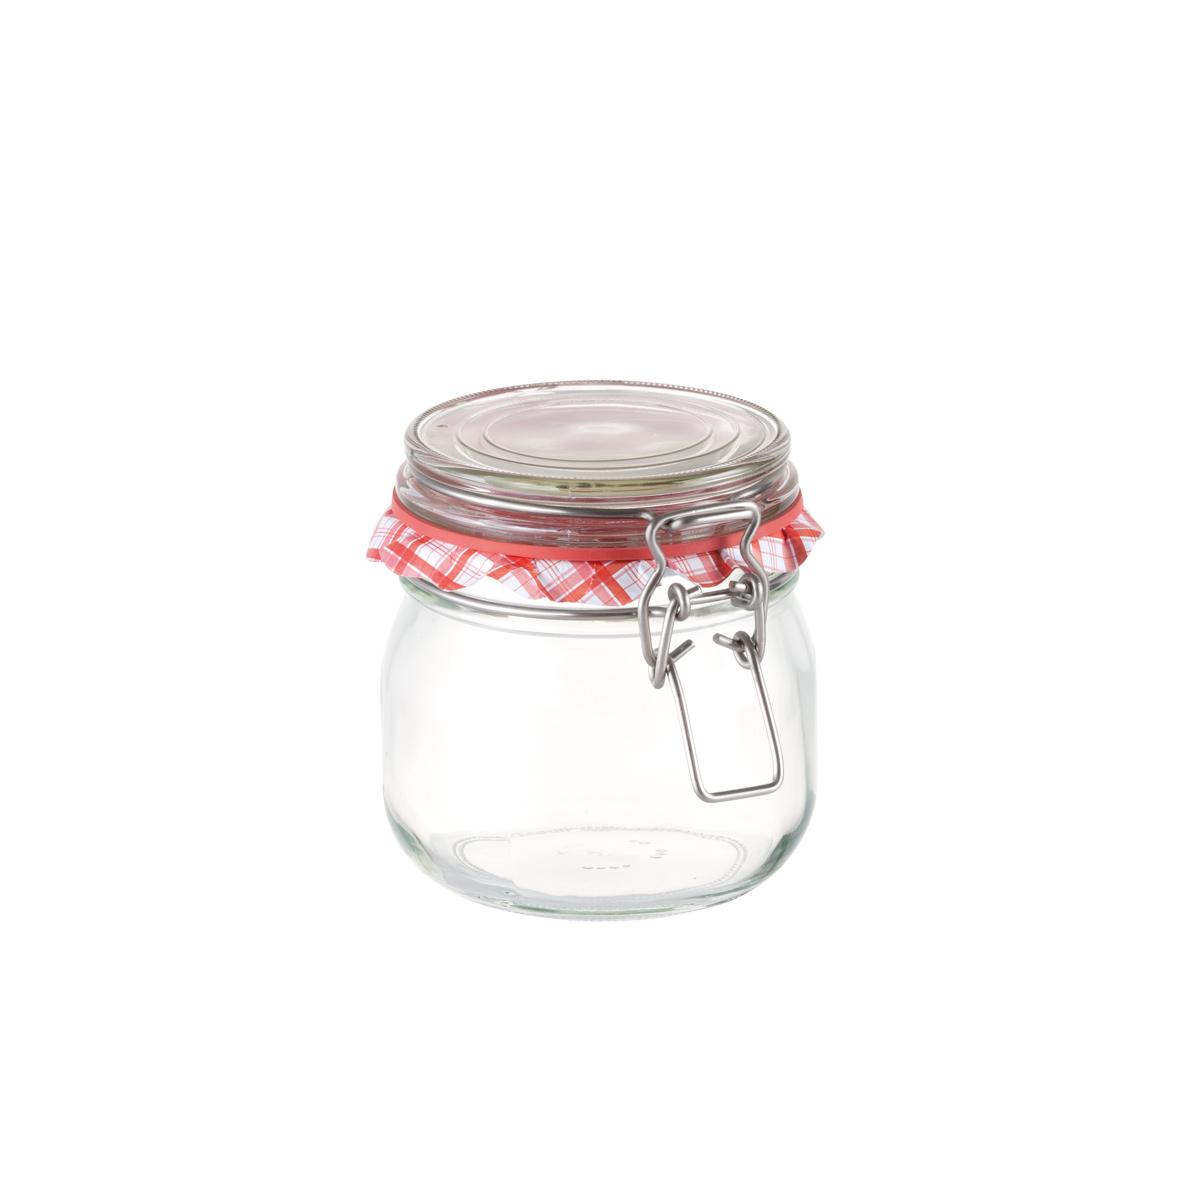 Zavařovací sklenice s klipem TESCOMA DELLA CASA 600 ml